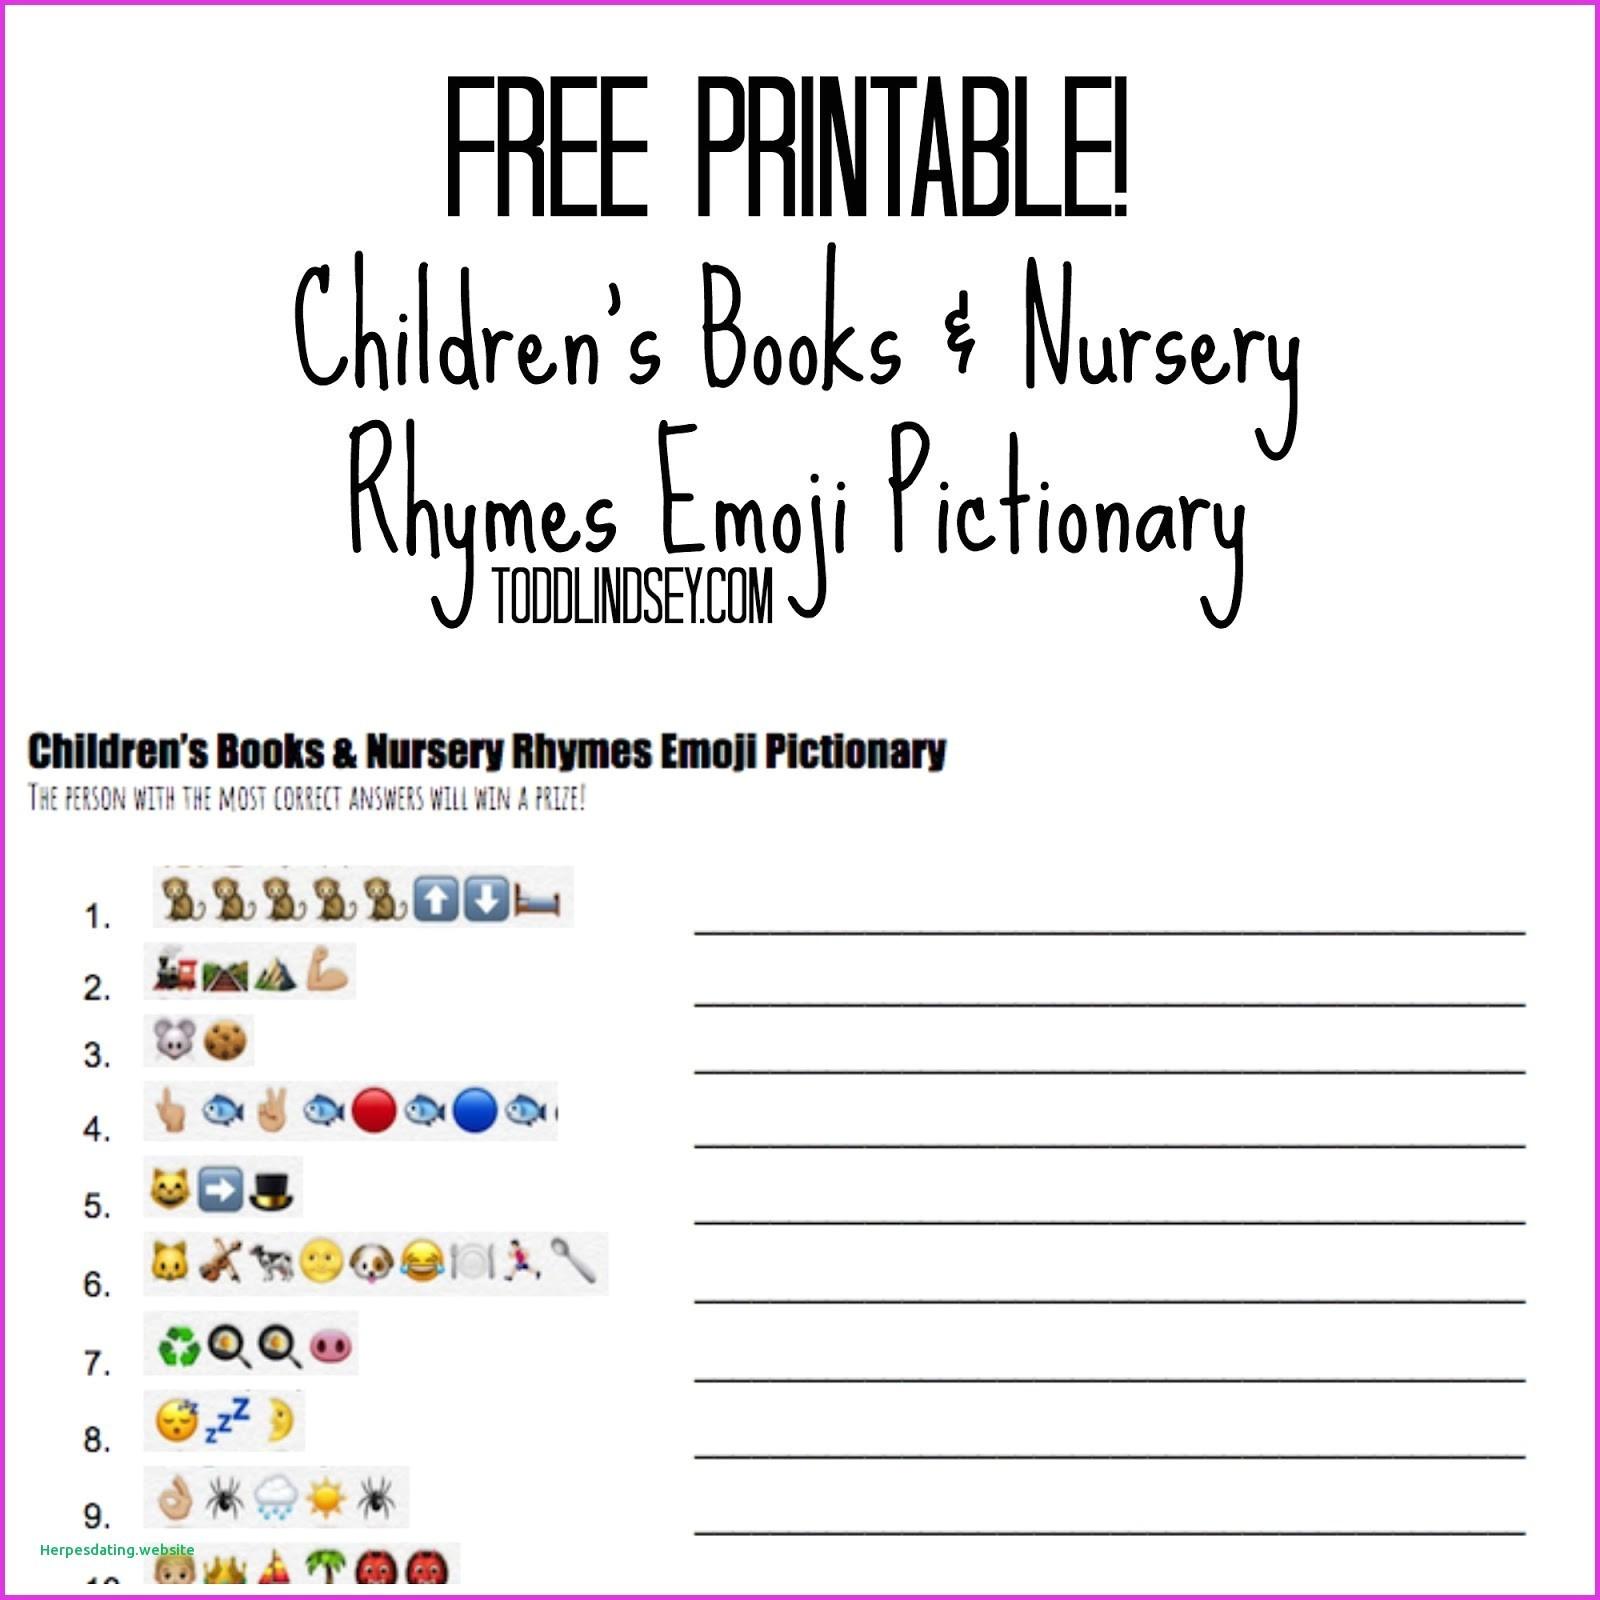 New Free Printable Children S Church Curriculum Fresh 36 New - Free Printable Children's Church Curriculum